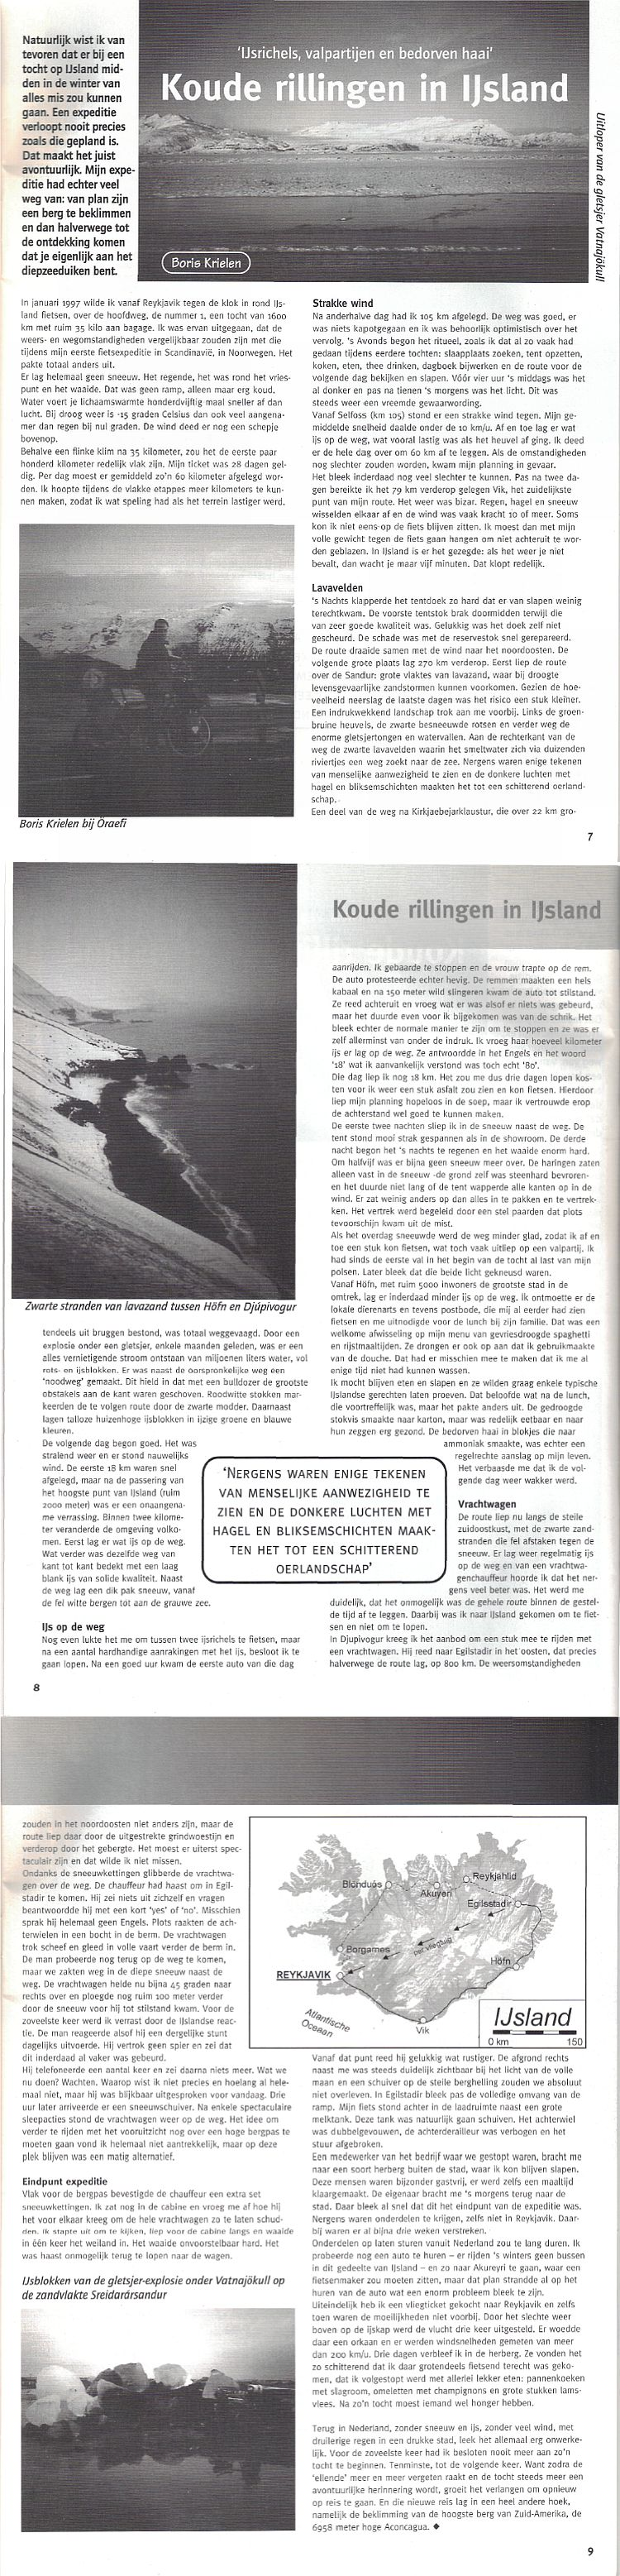 ijsland_1999_dewereldfietser